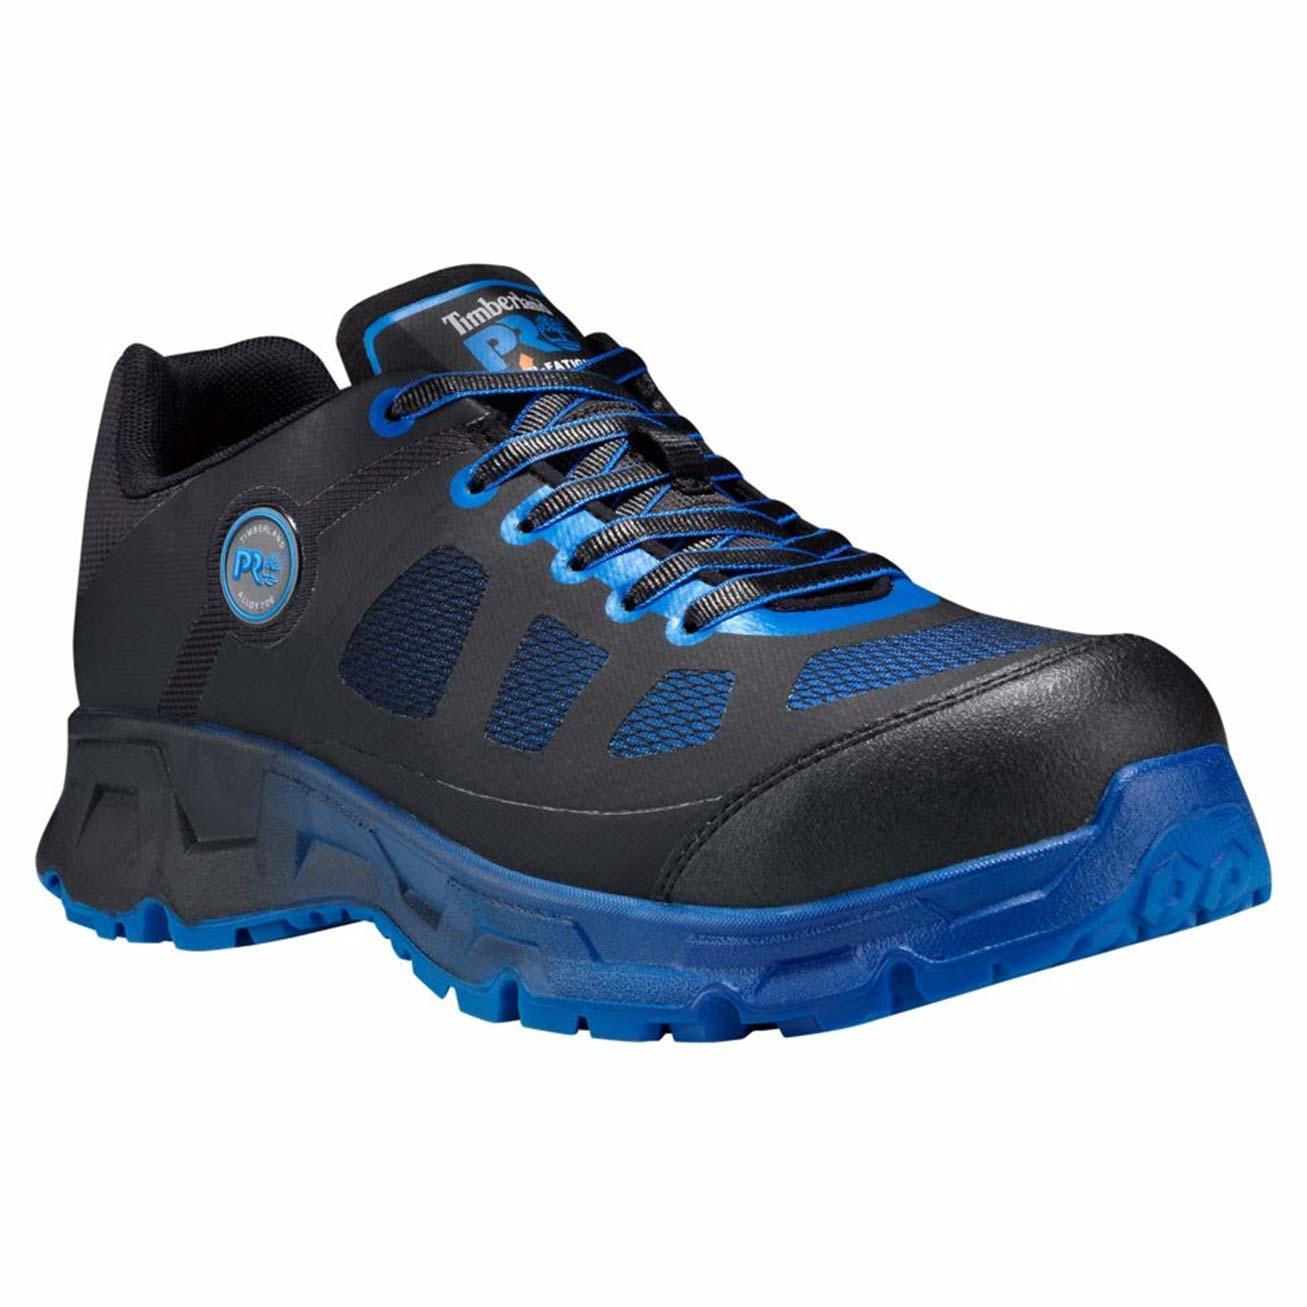 05ceb1e8e34 Timberland PRO Velocity Alloy Toe Static-Dissipative Work Shoe